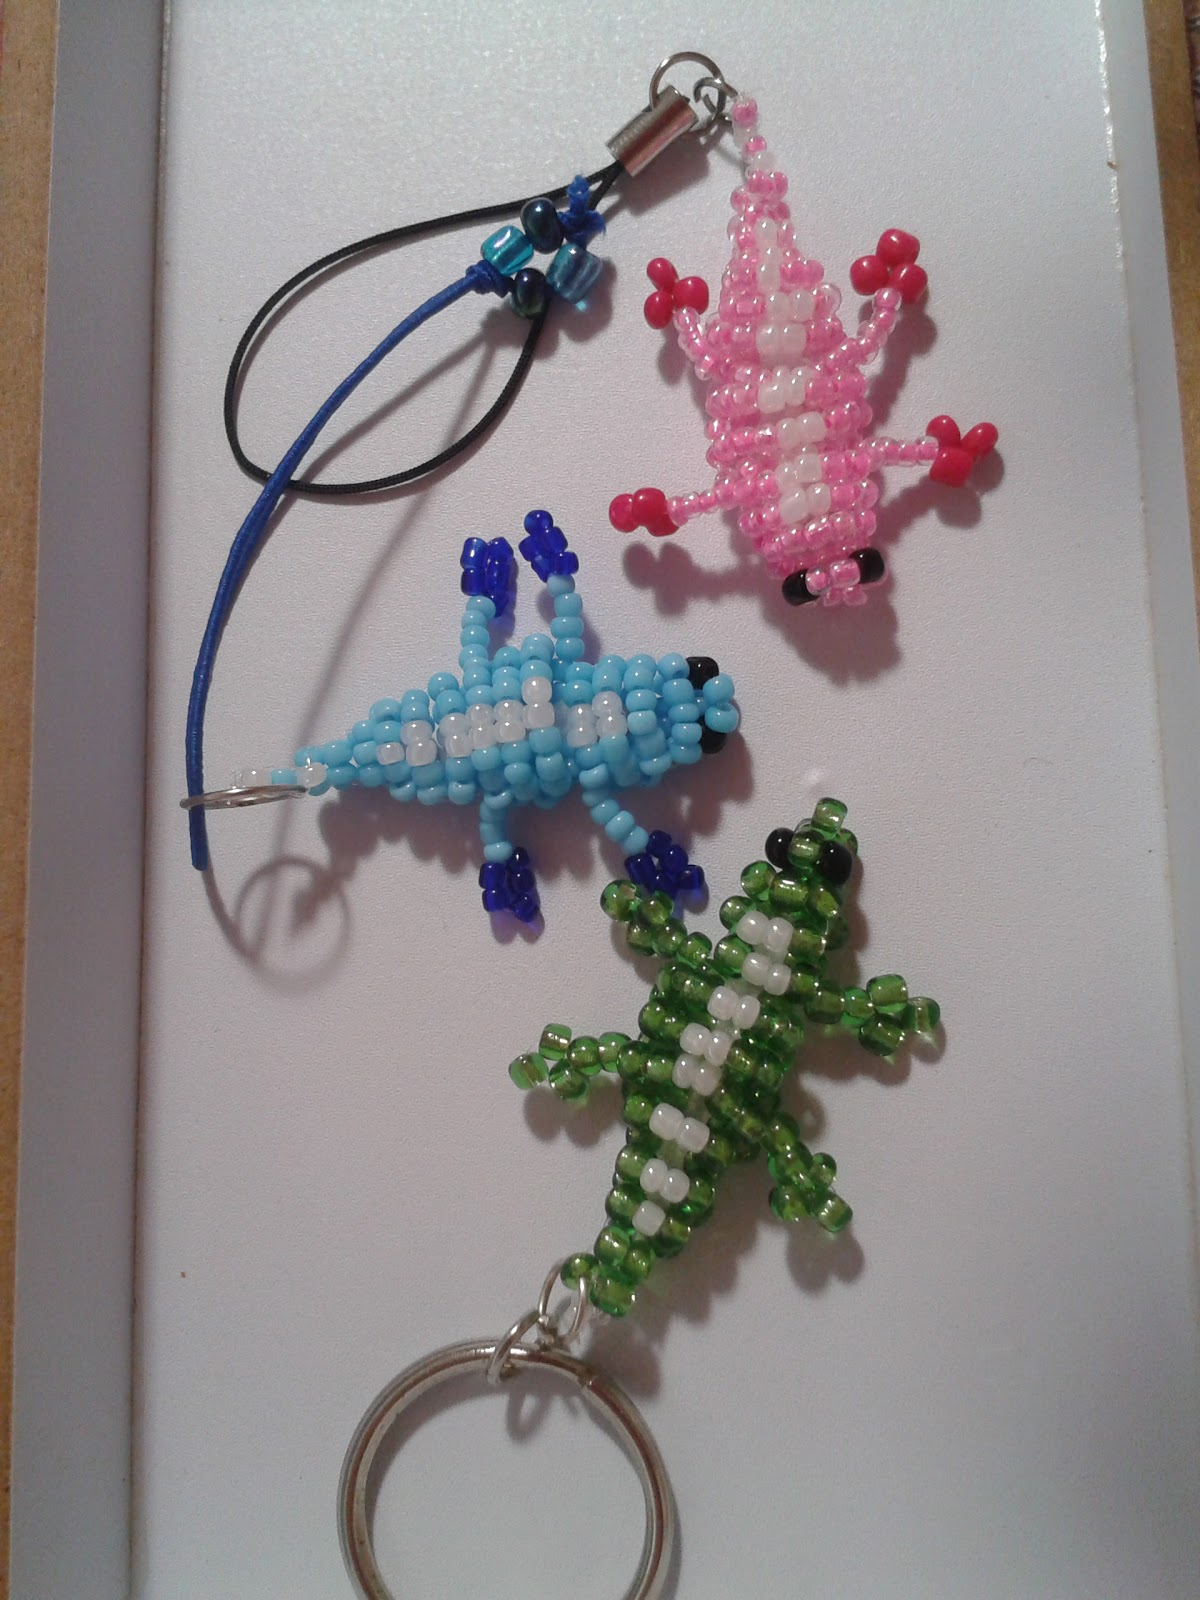 Serenata manualidades de color cocodrilos de bolitas for Manualidades con bolitas